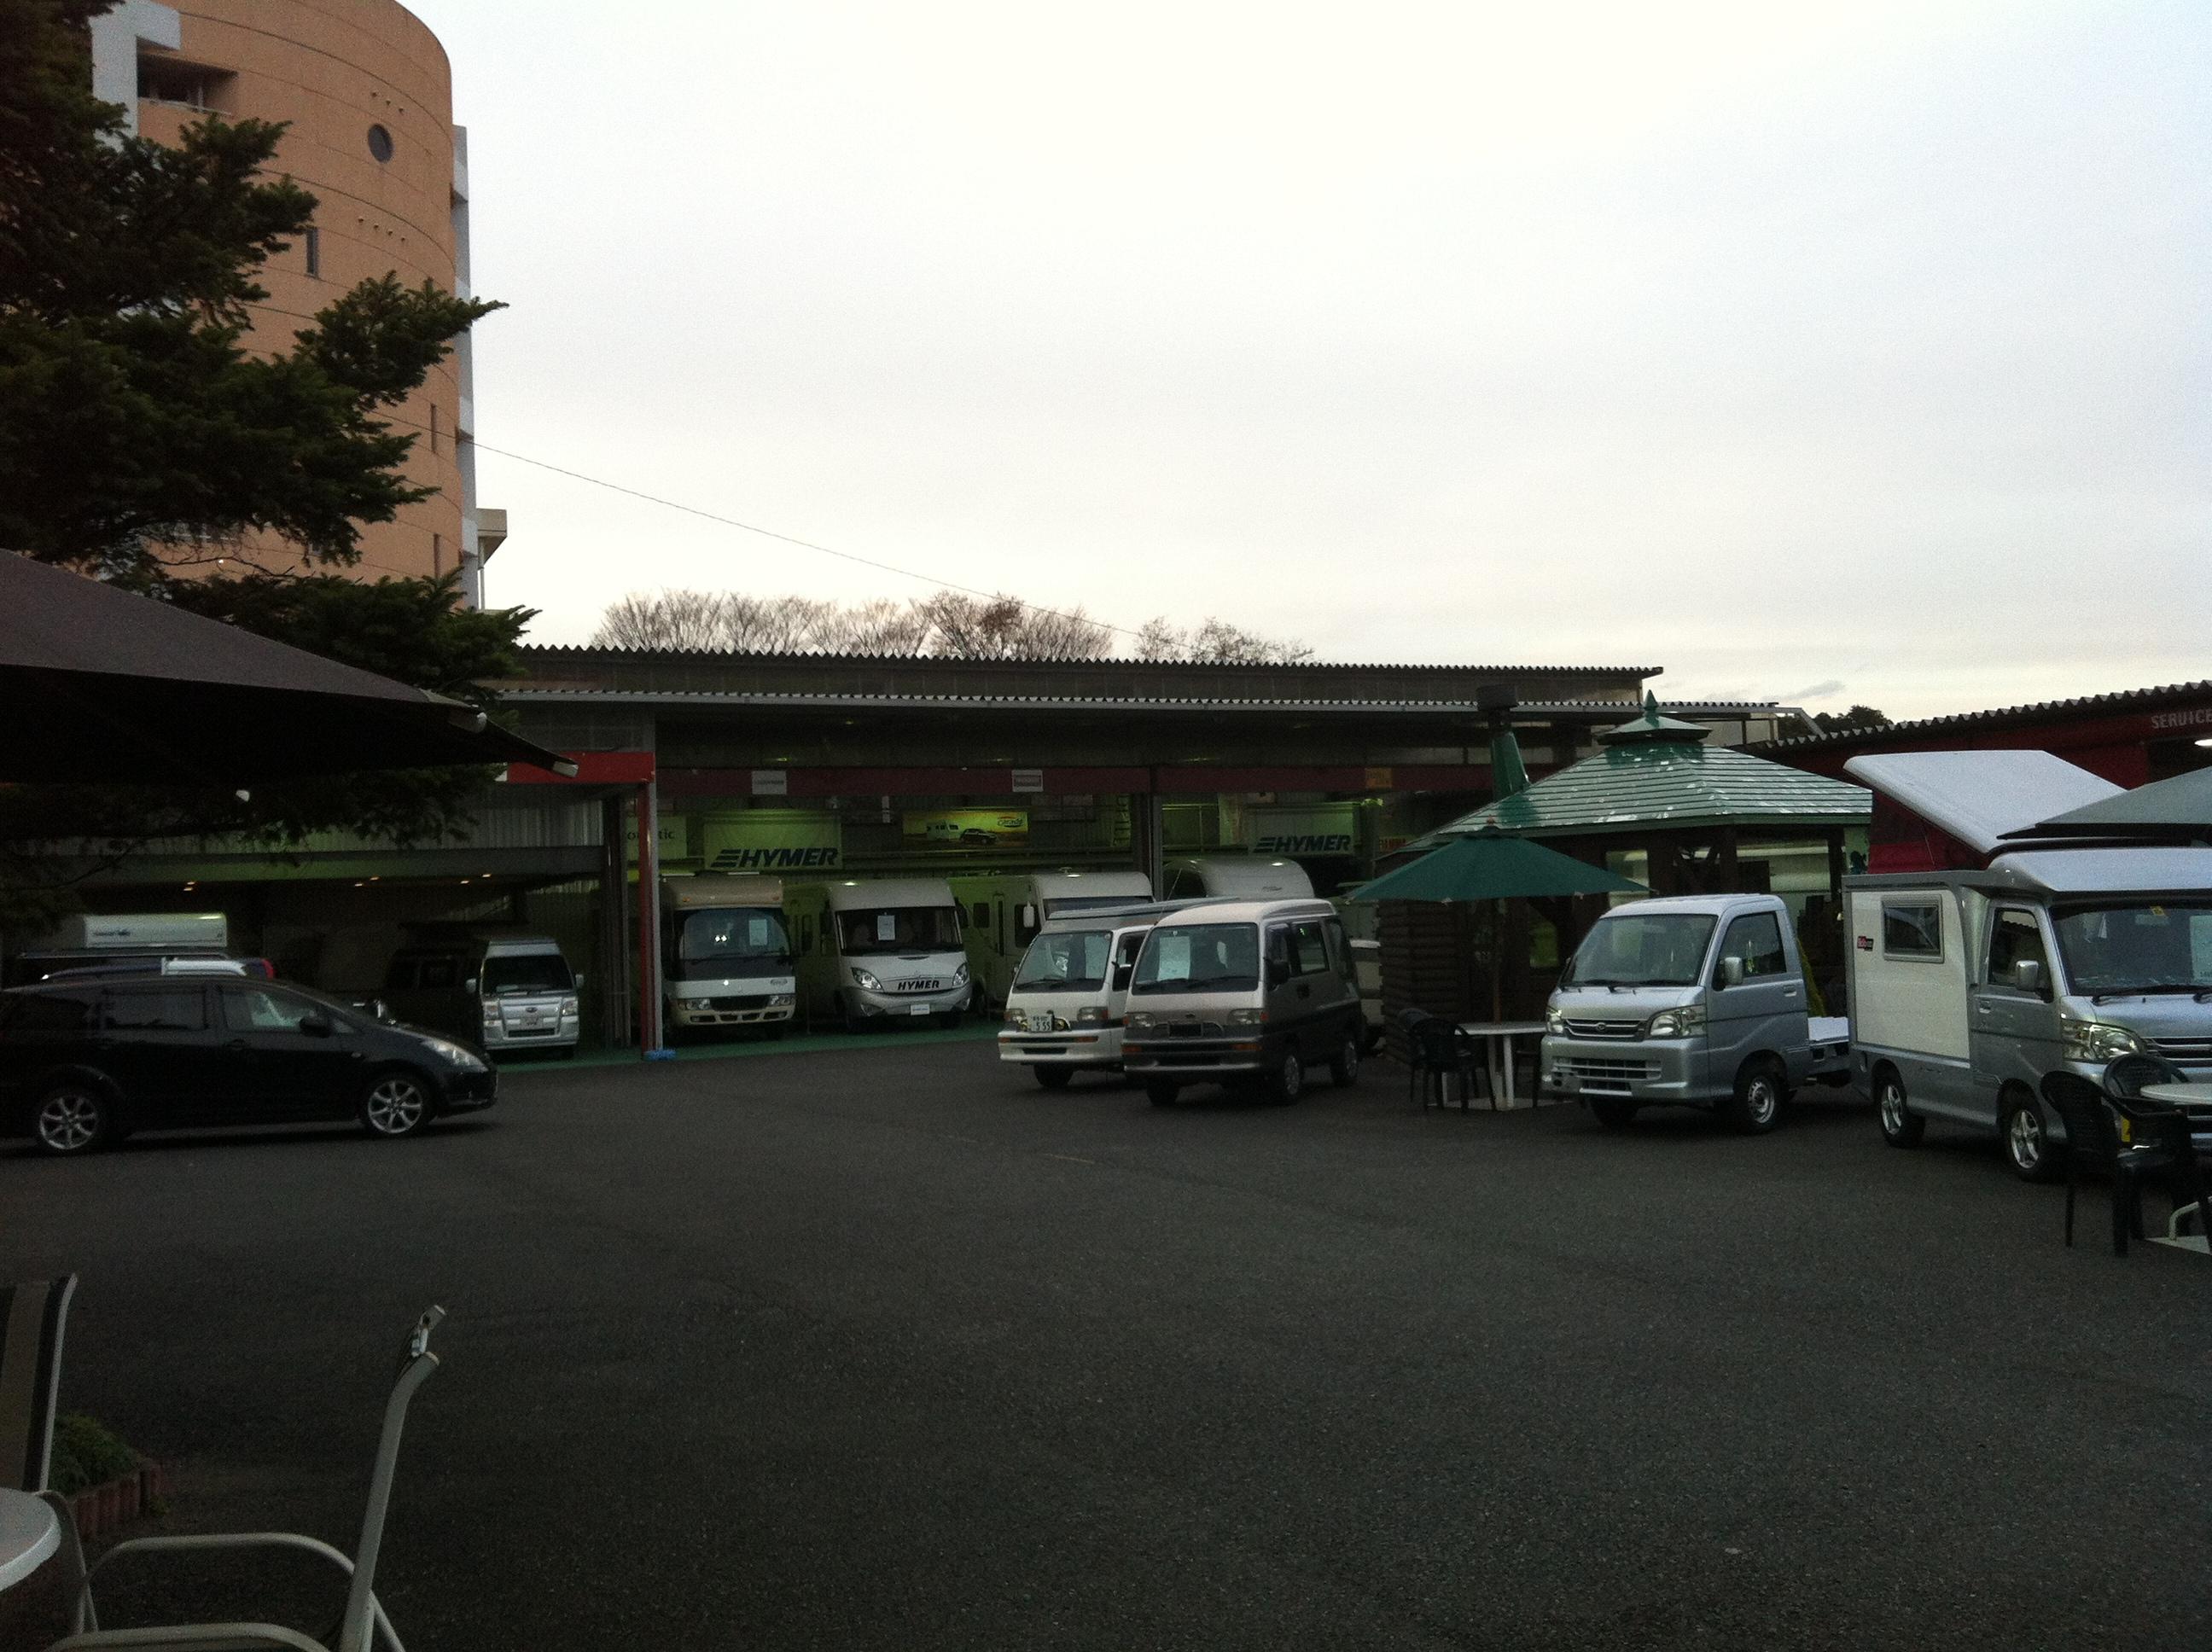 http://www.vantech.jp/shops/info/IMG_0611.JPG